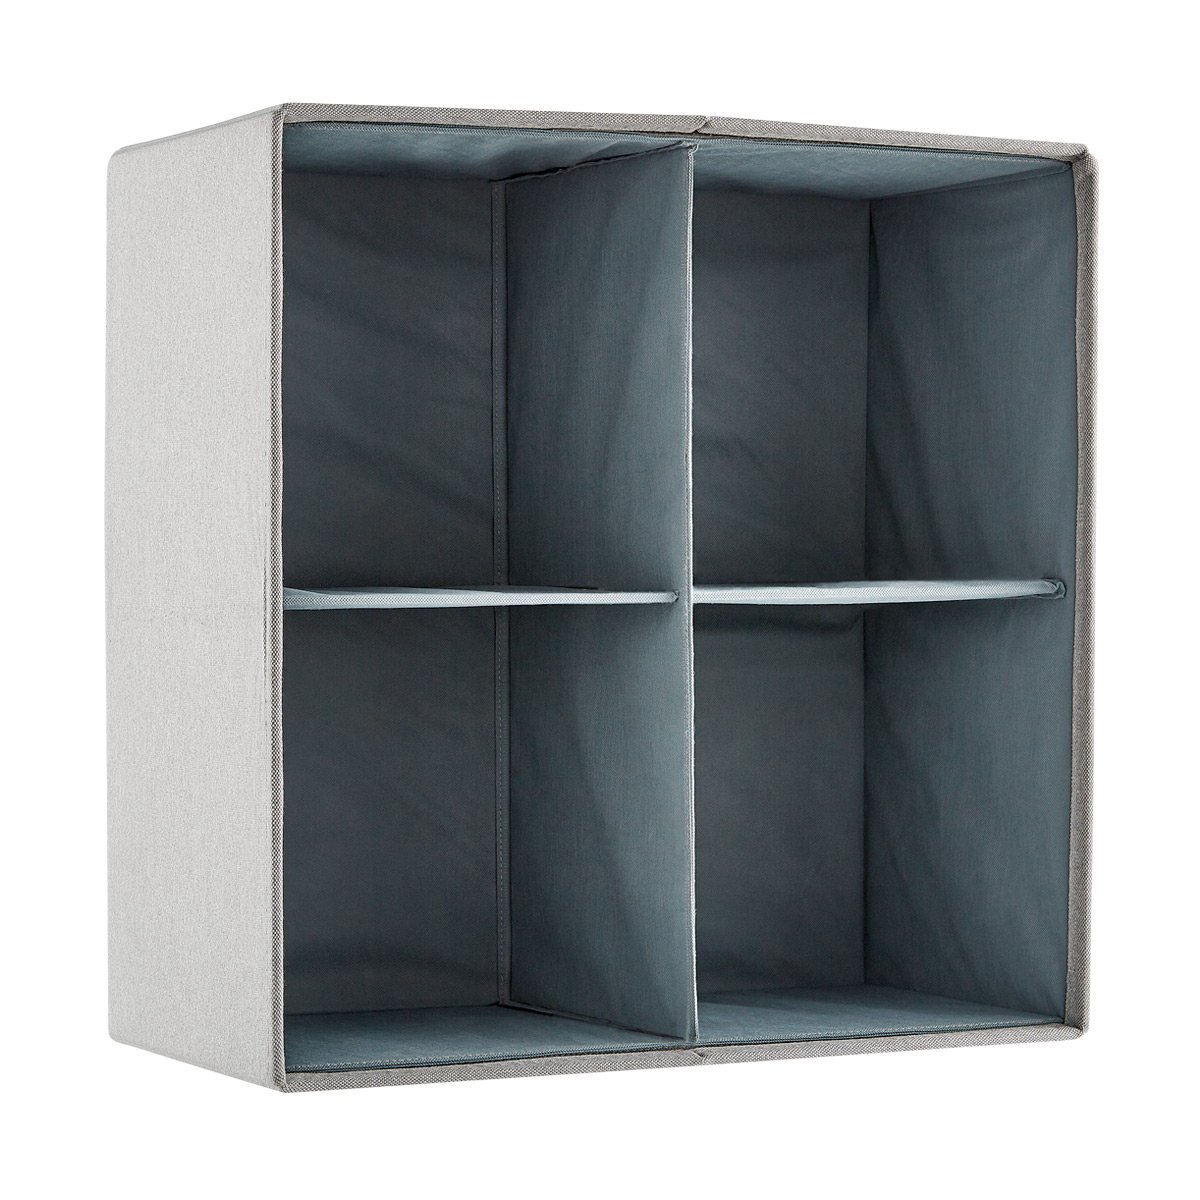 Poppin 2x2 Fabric Storage Cubby